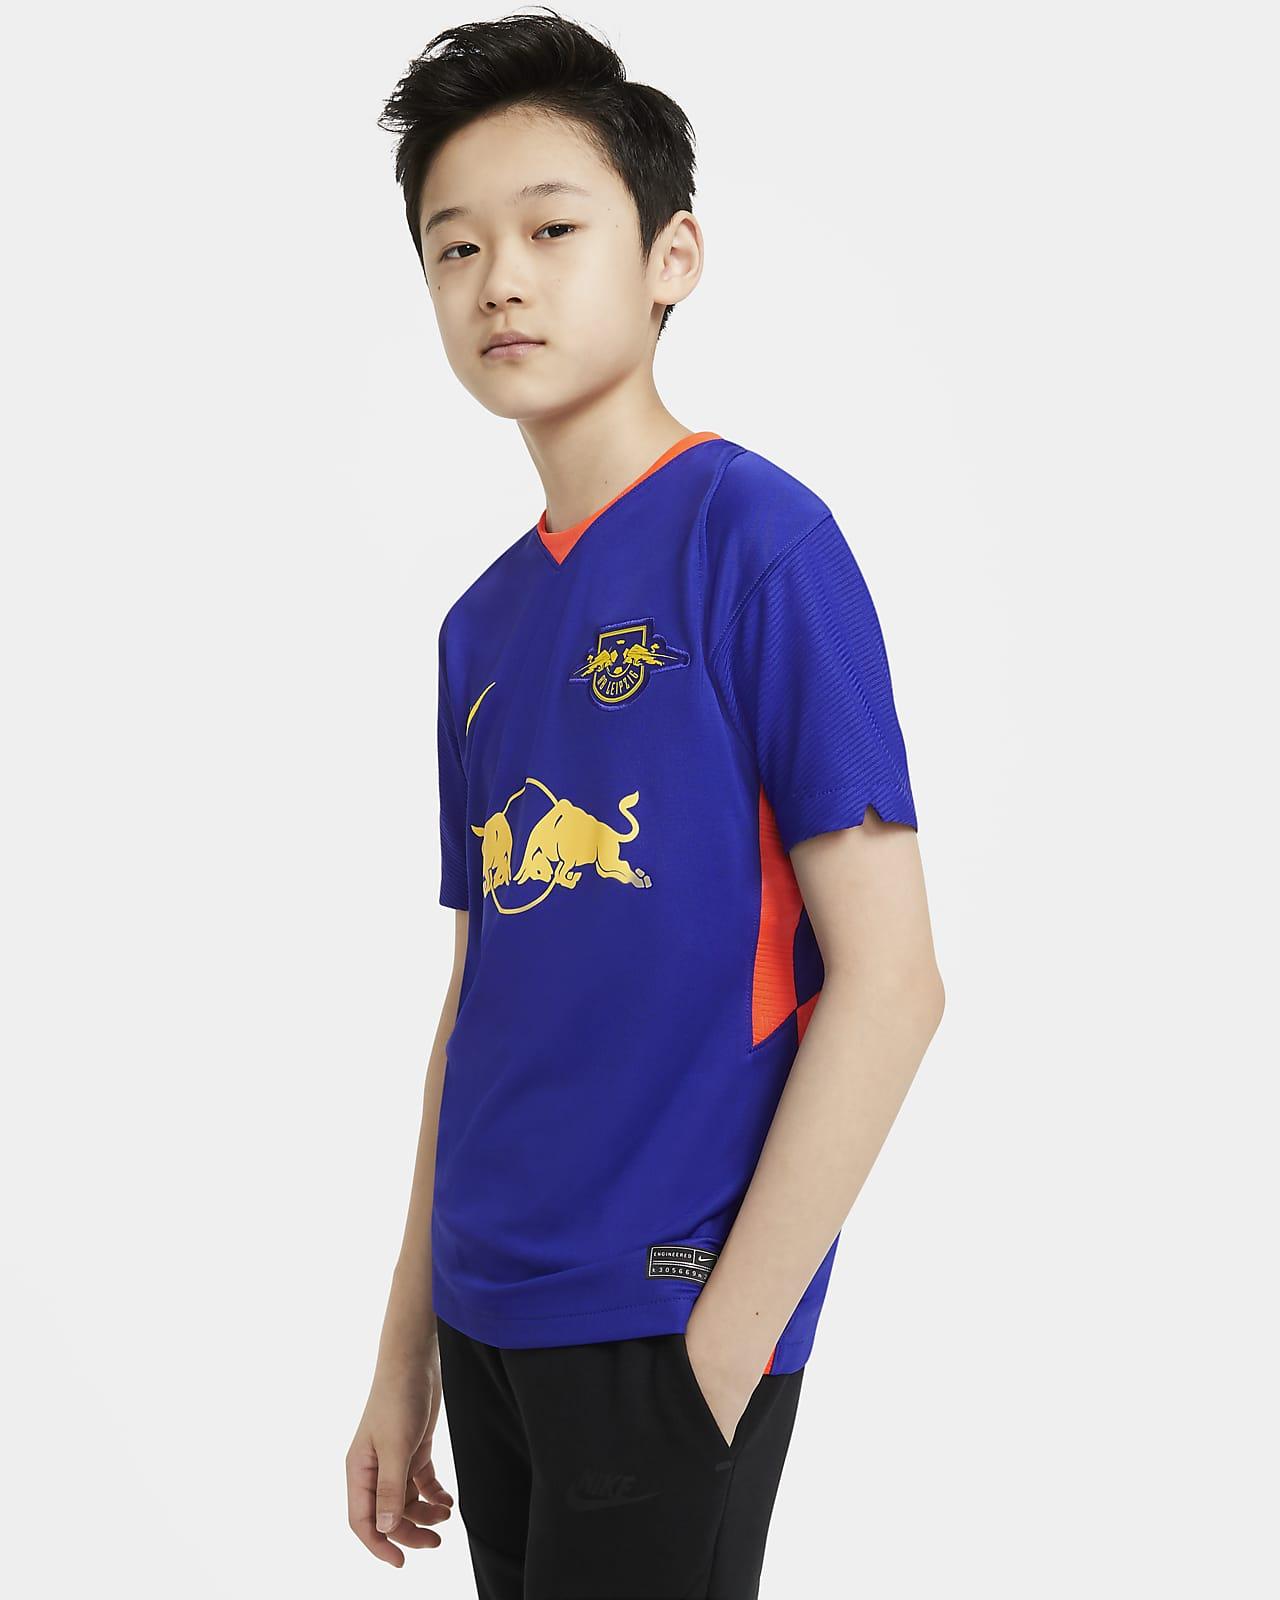 Rb Leipzig 2020 21 Stadium Away Older Kids Football Shirt Nike Ie